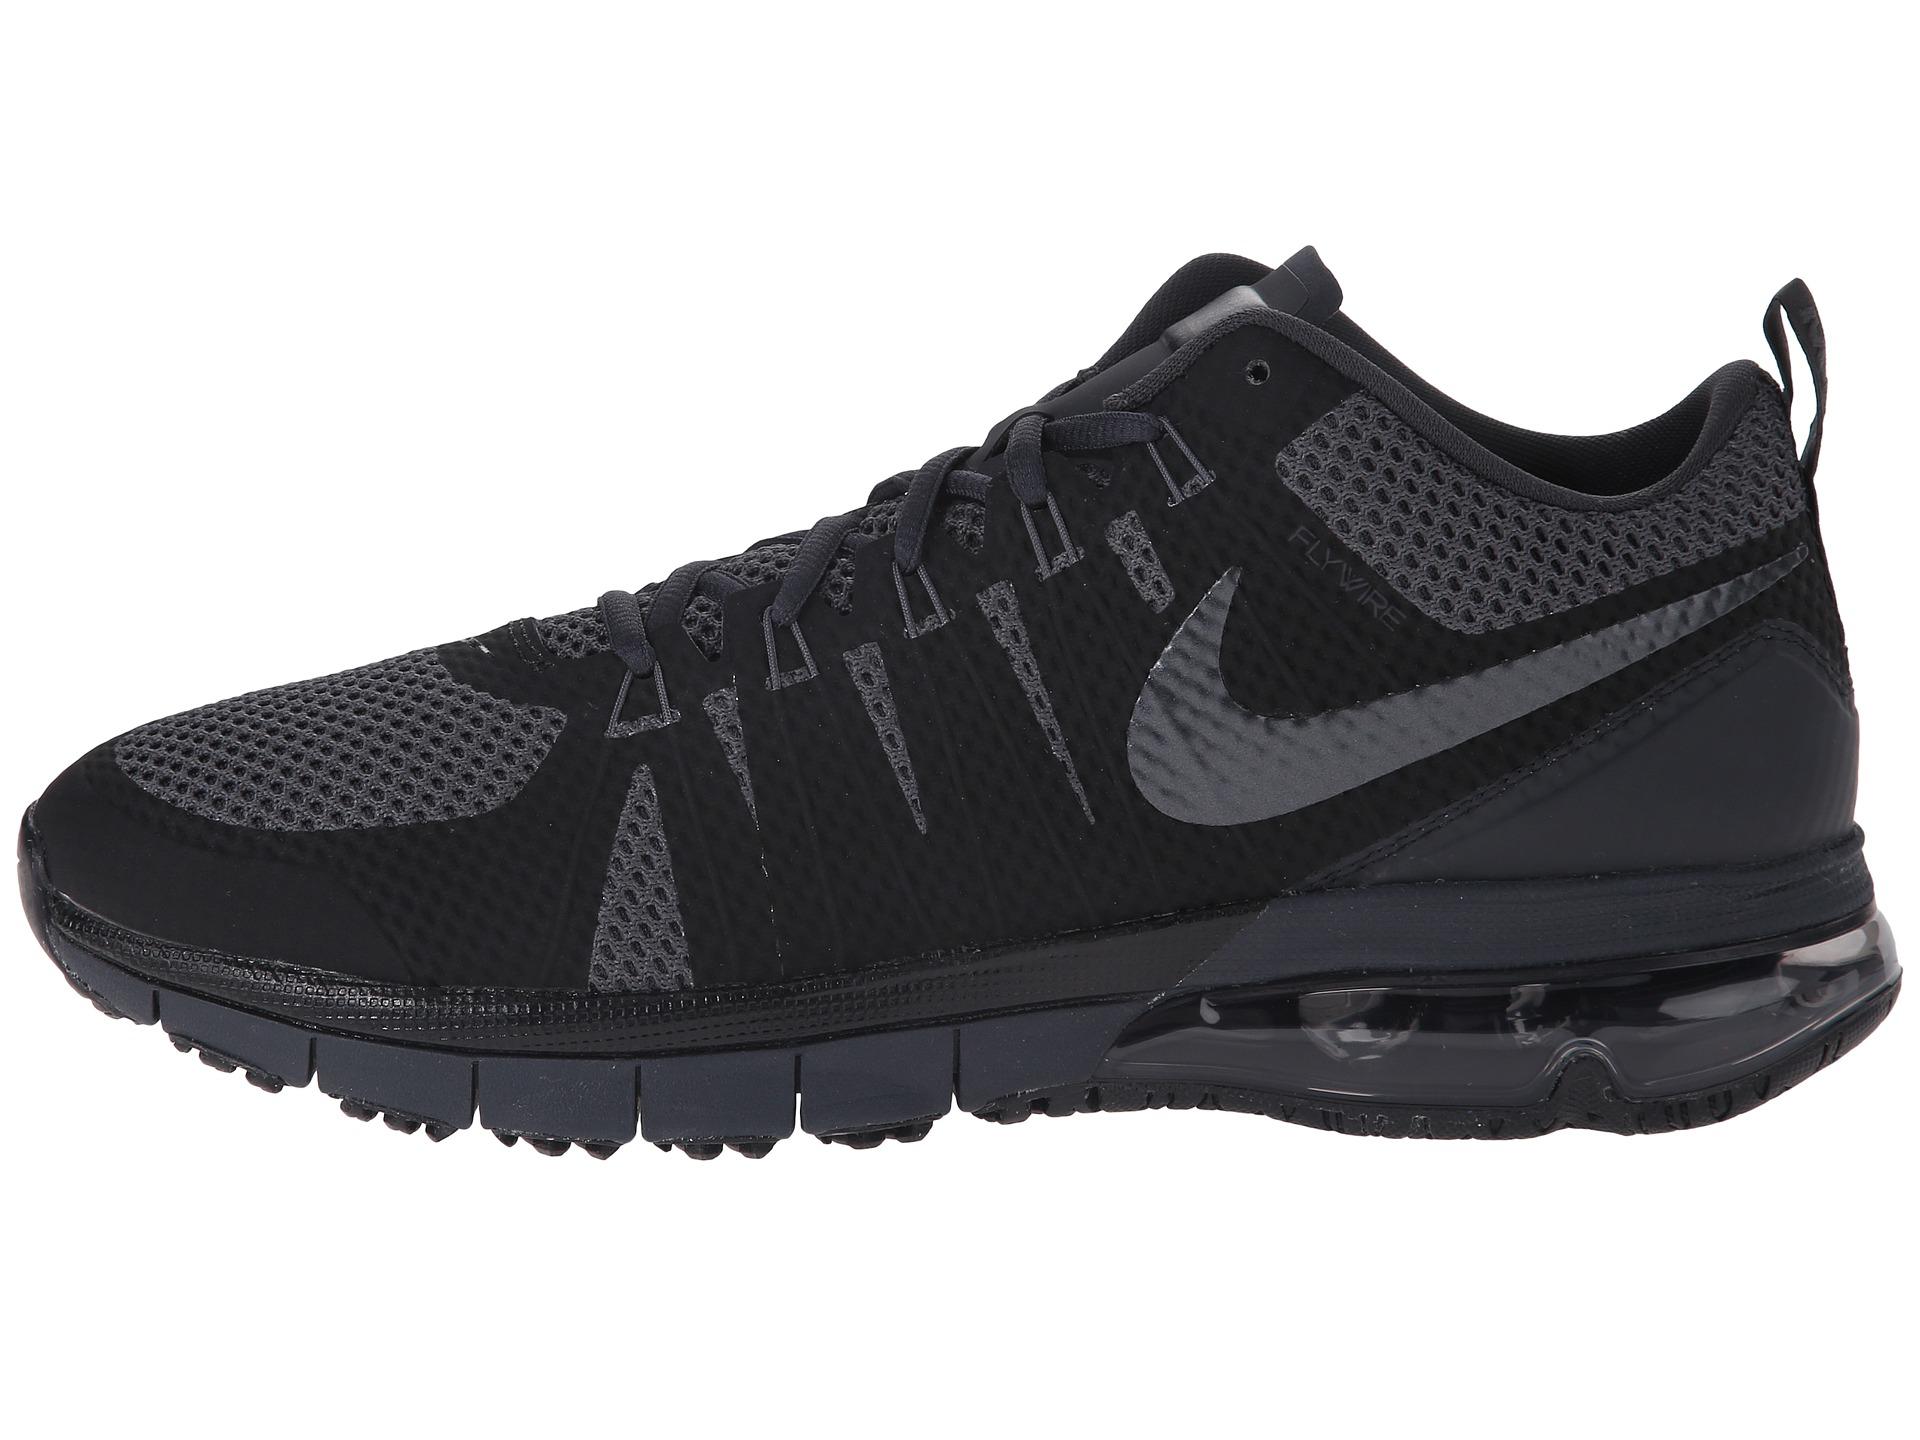 0d9526c230 ... Black White Nike Air Max TR180 Low-Top Sneakers in Gray for Men Lyst ...